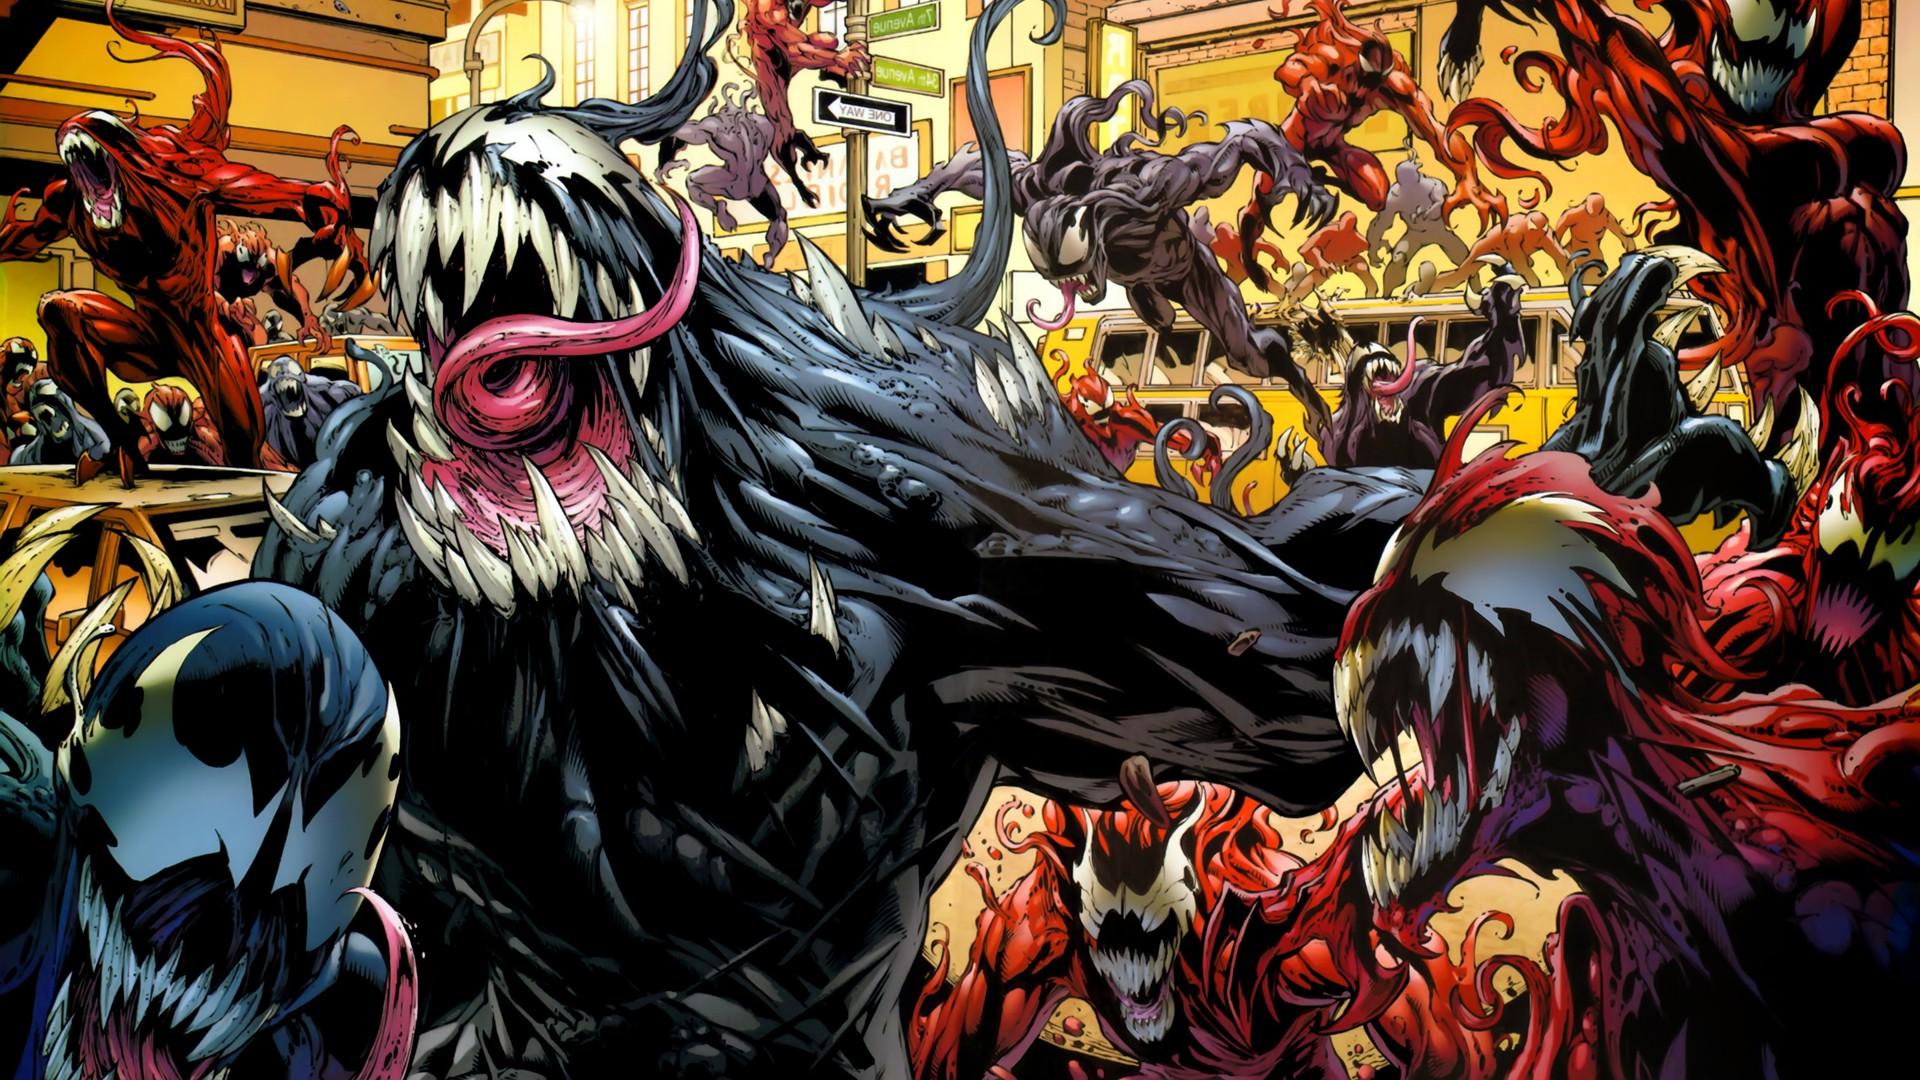 1920x1080 Px Carnage Comics Venom